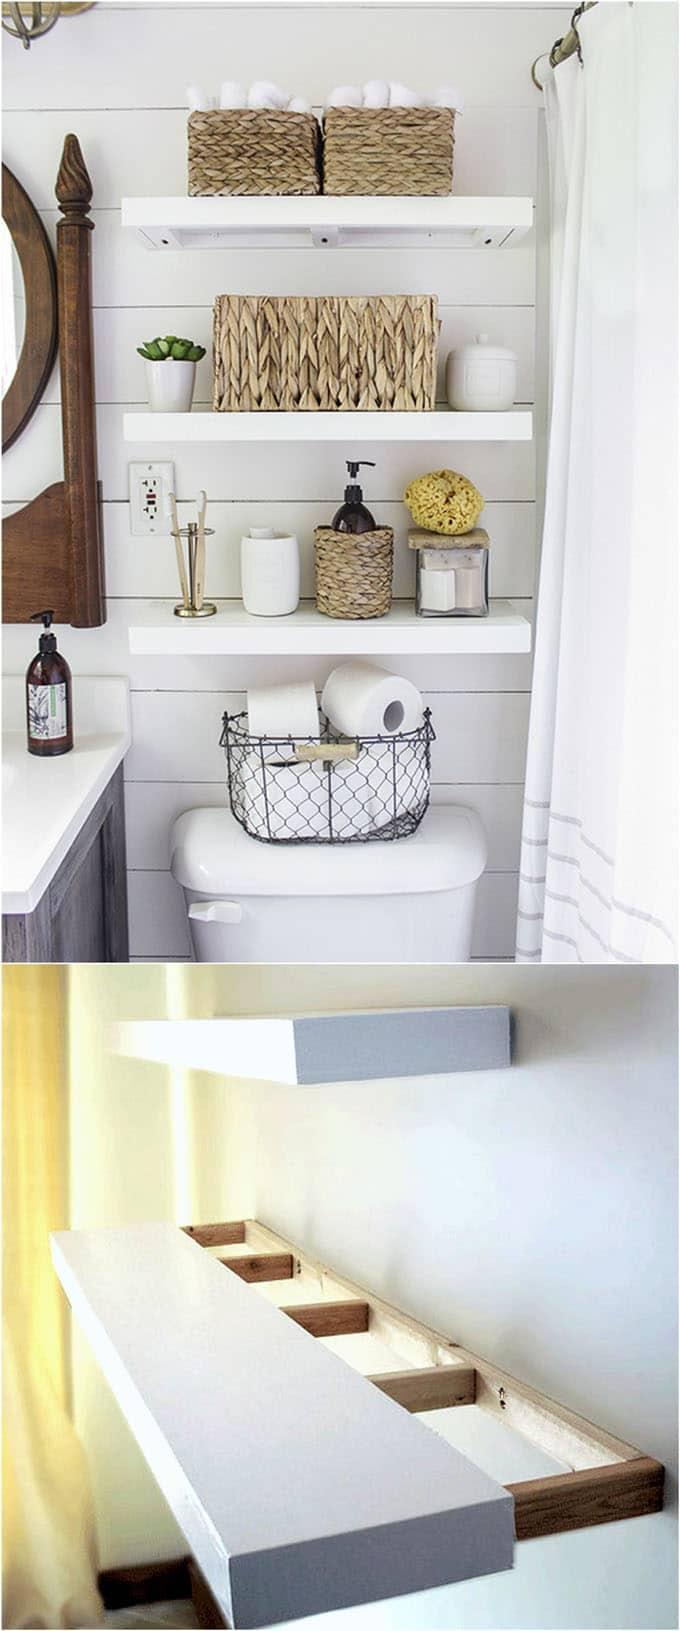 16 Easy And Stylish Diy Floating Shelves Wall Shelves